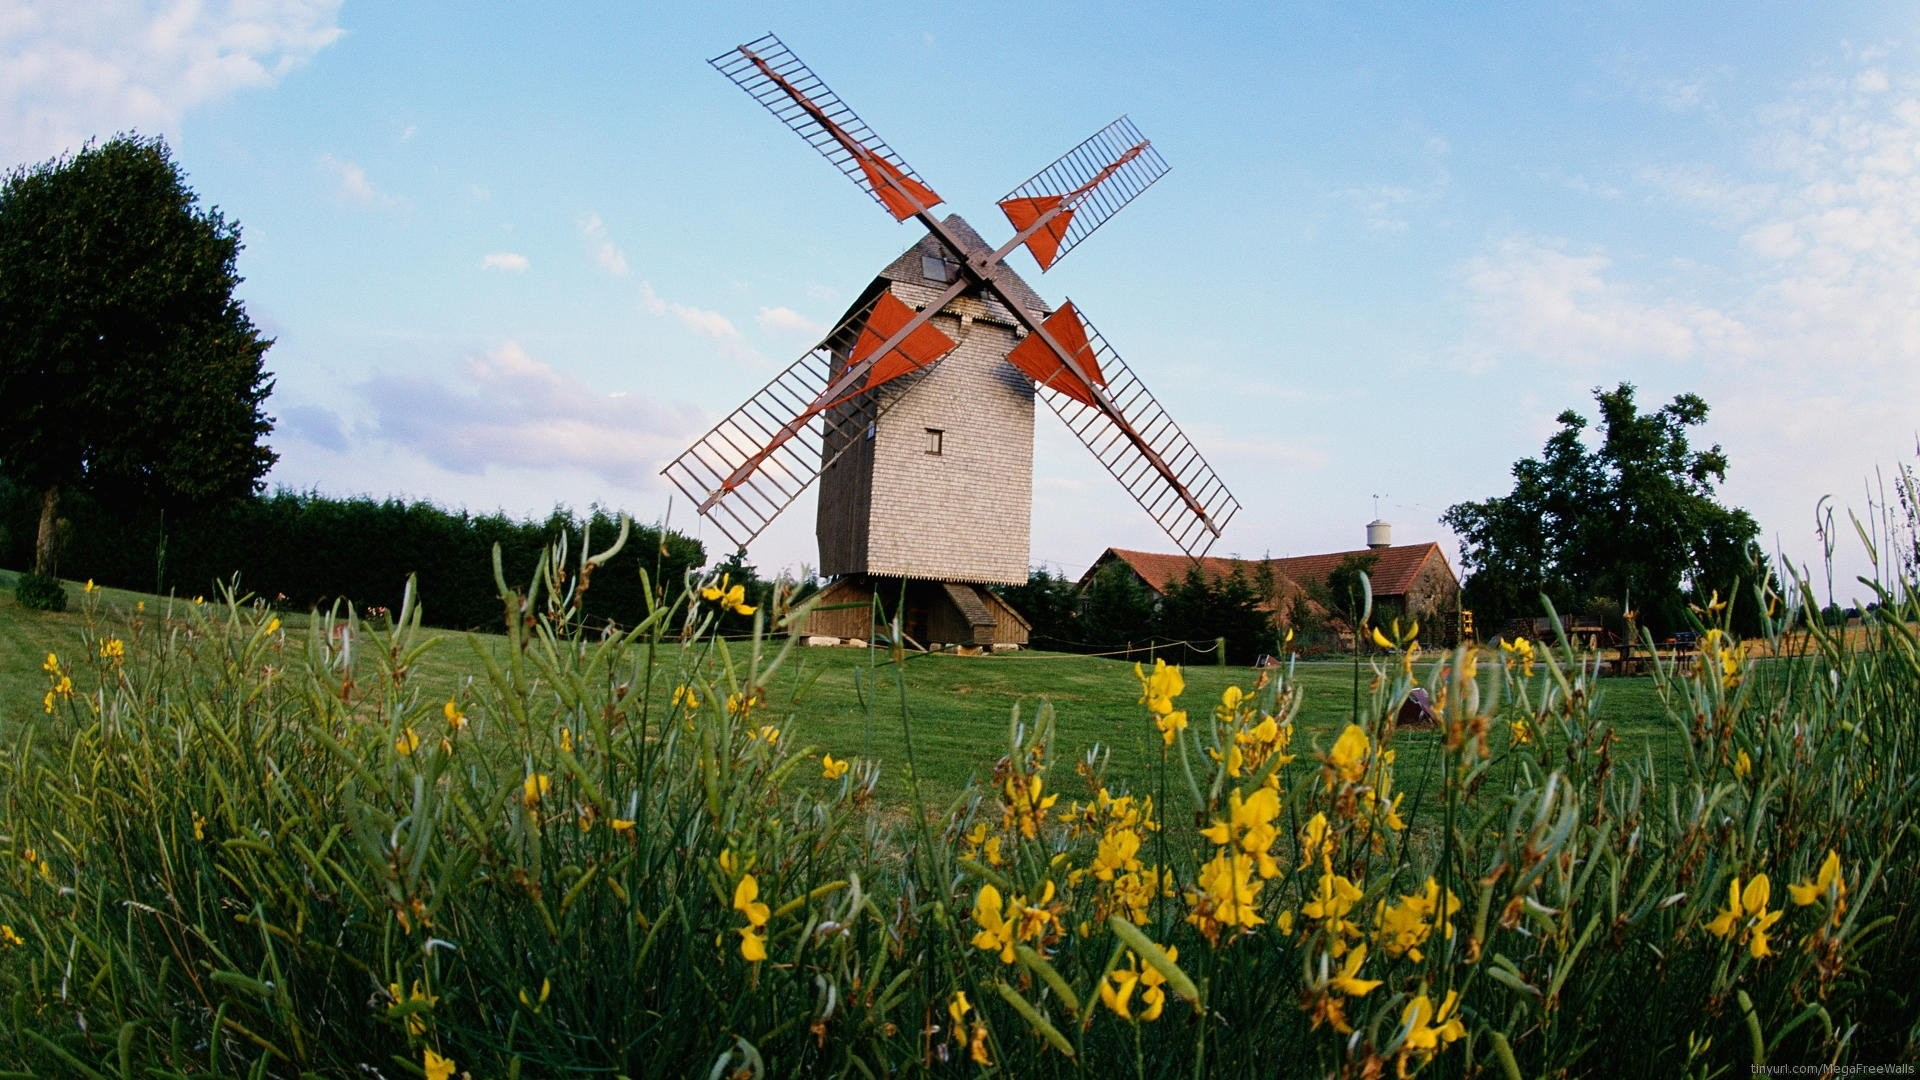 Man Made – Windmill Wallpaper